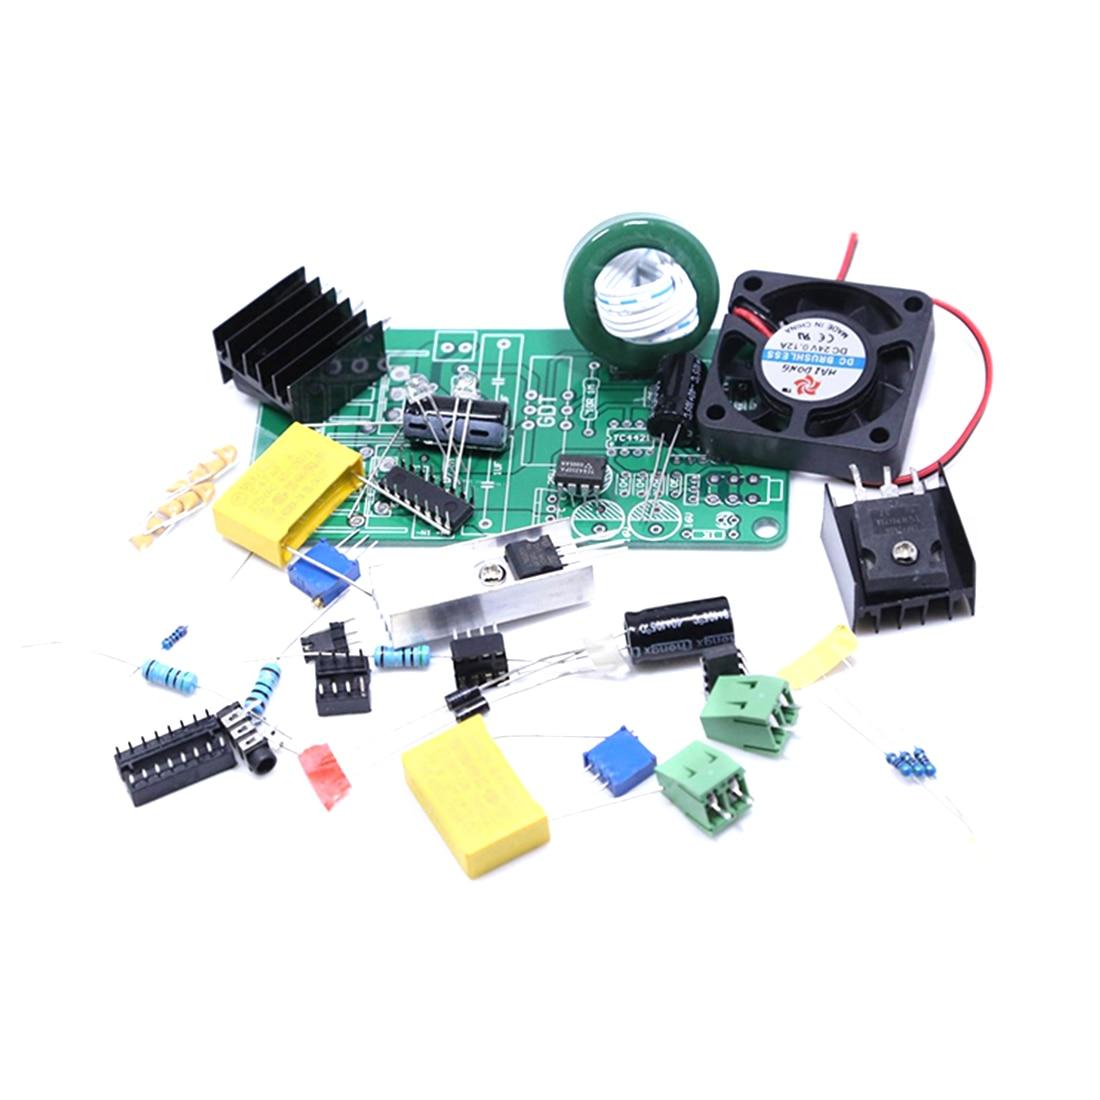 DIY Electronic Speaker Plasma Speaker Classic Tl494 Plasma Sound High Tech Programmable Accessories Kits - A Full Set Of Parts